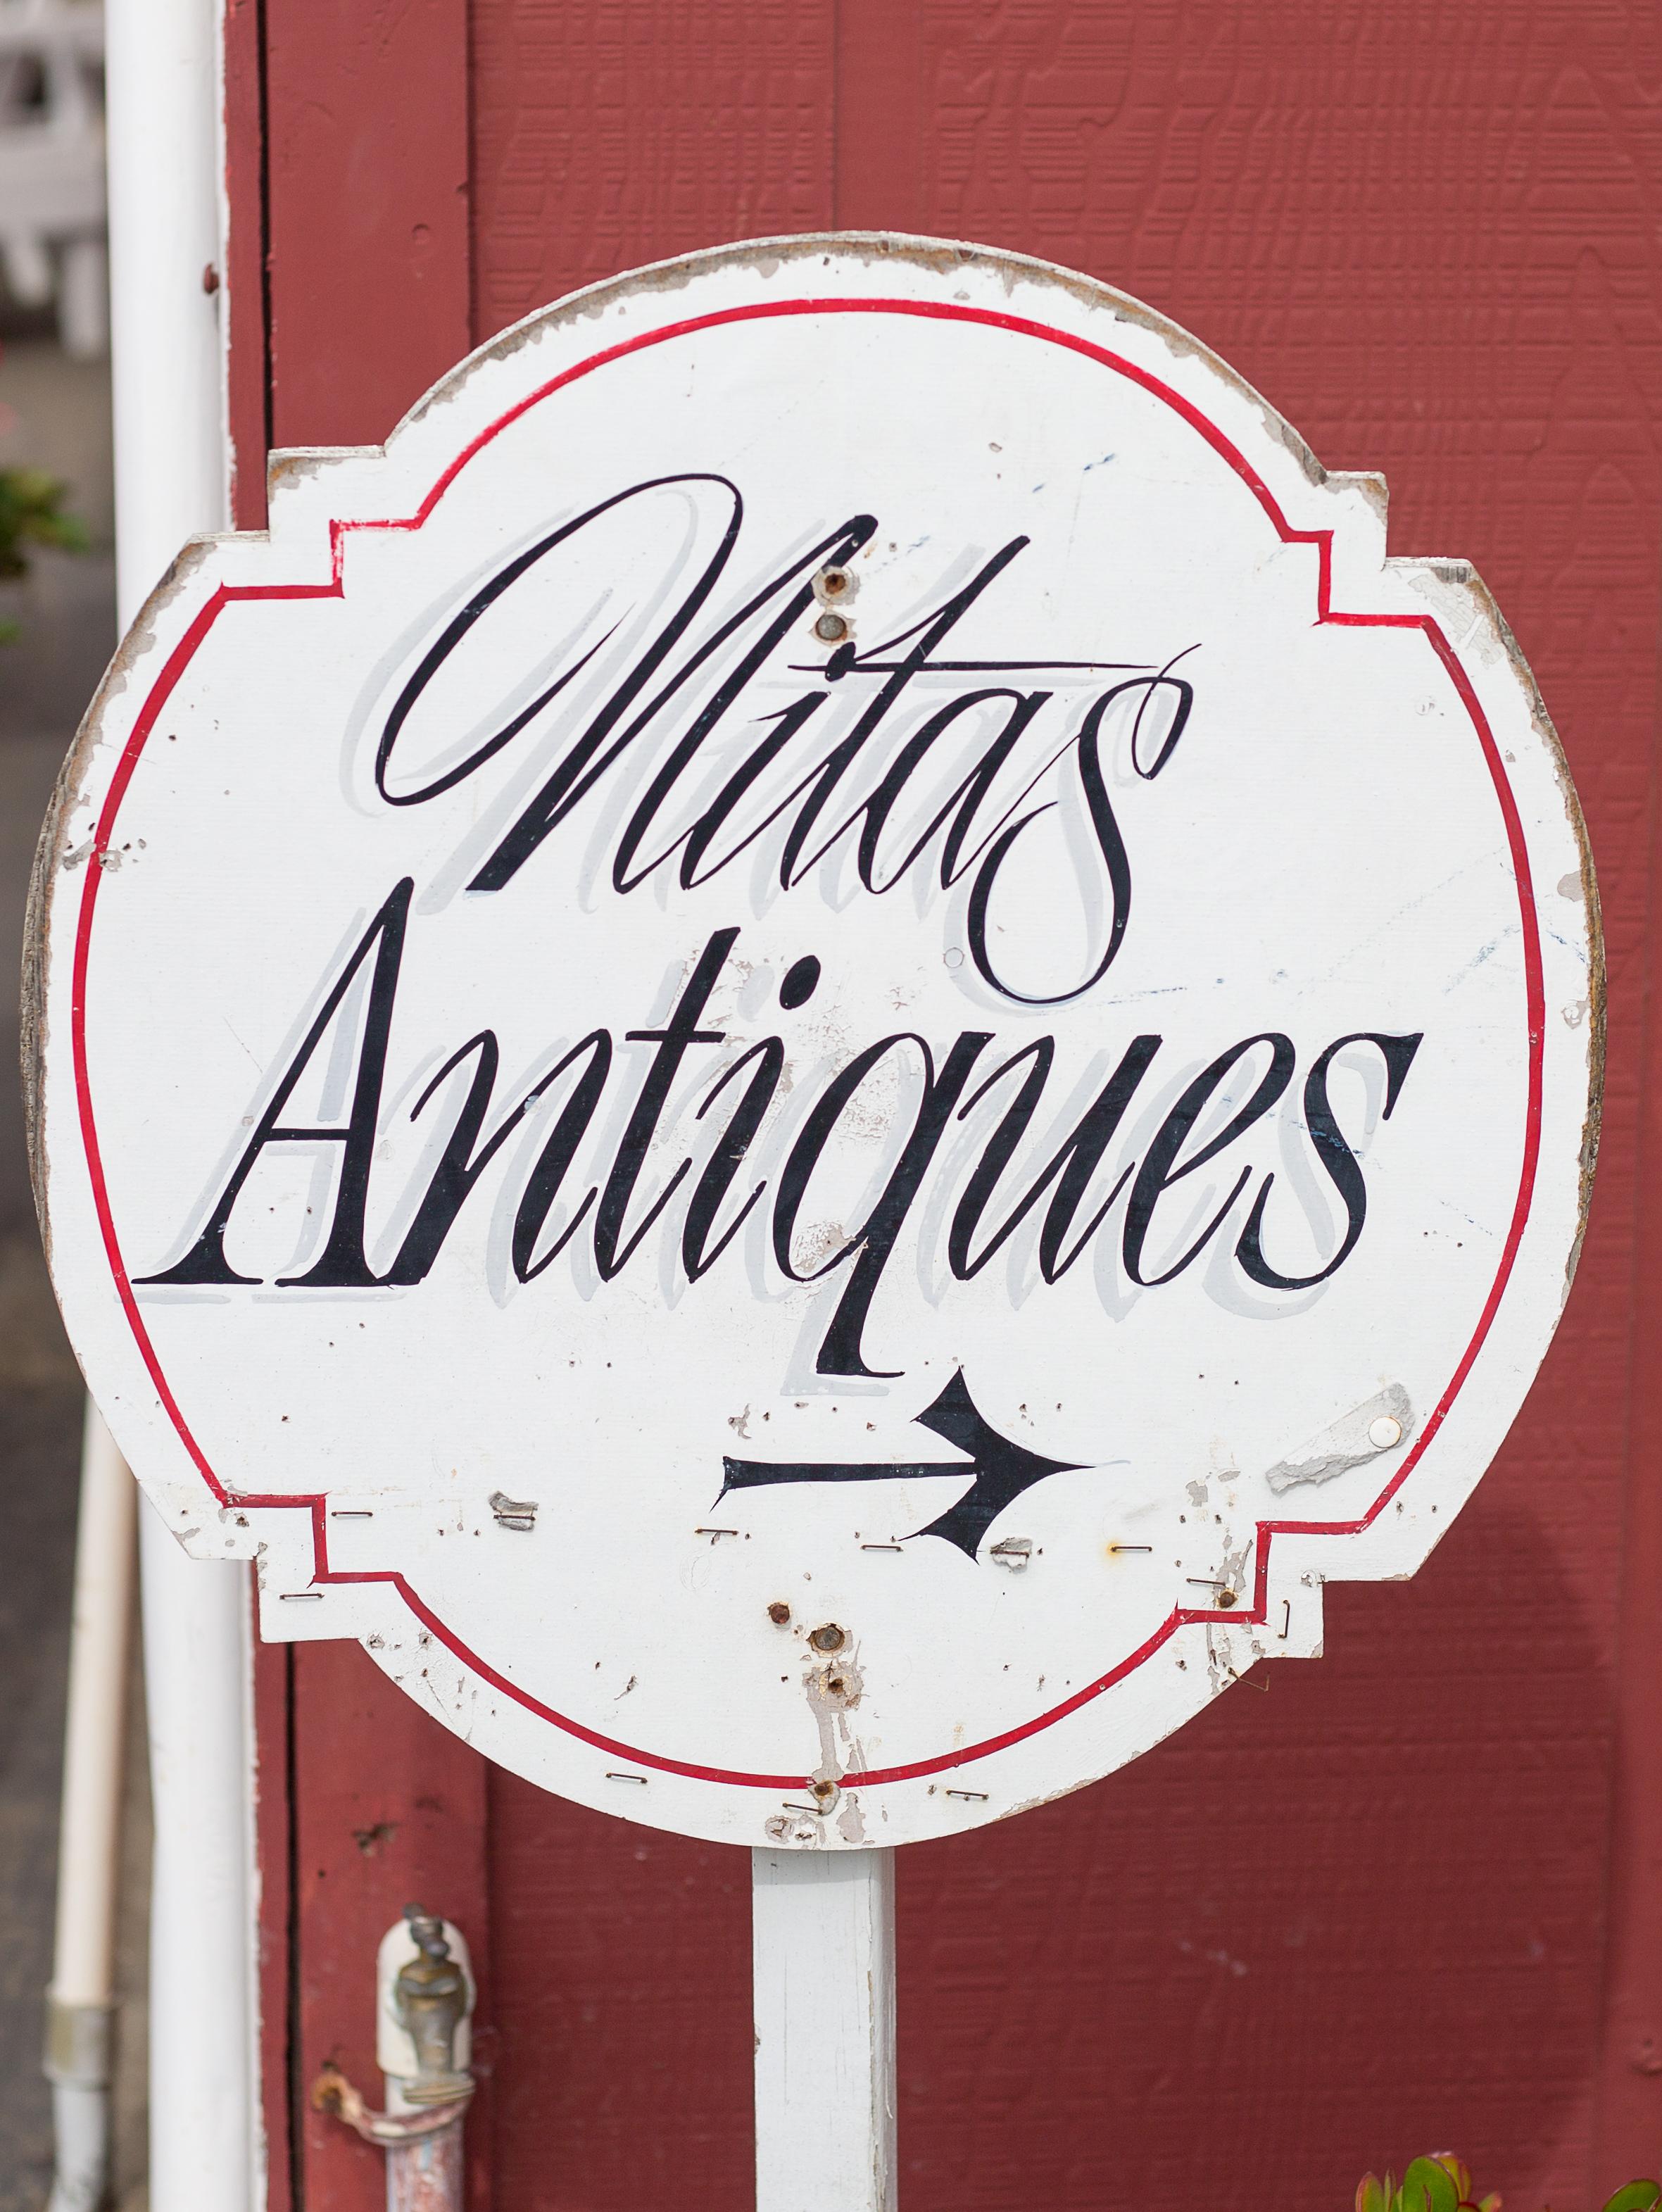 Nita's Antiques